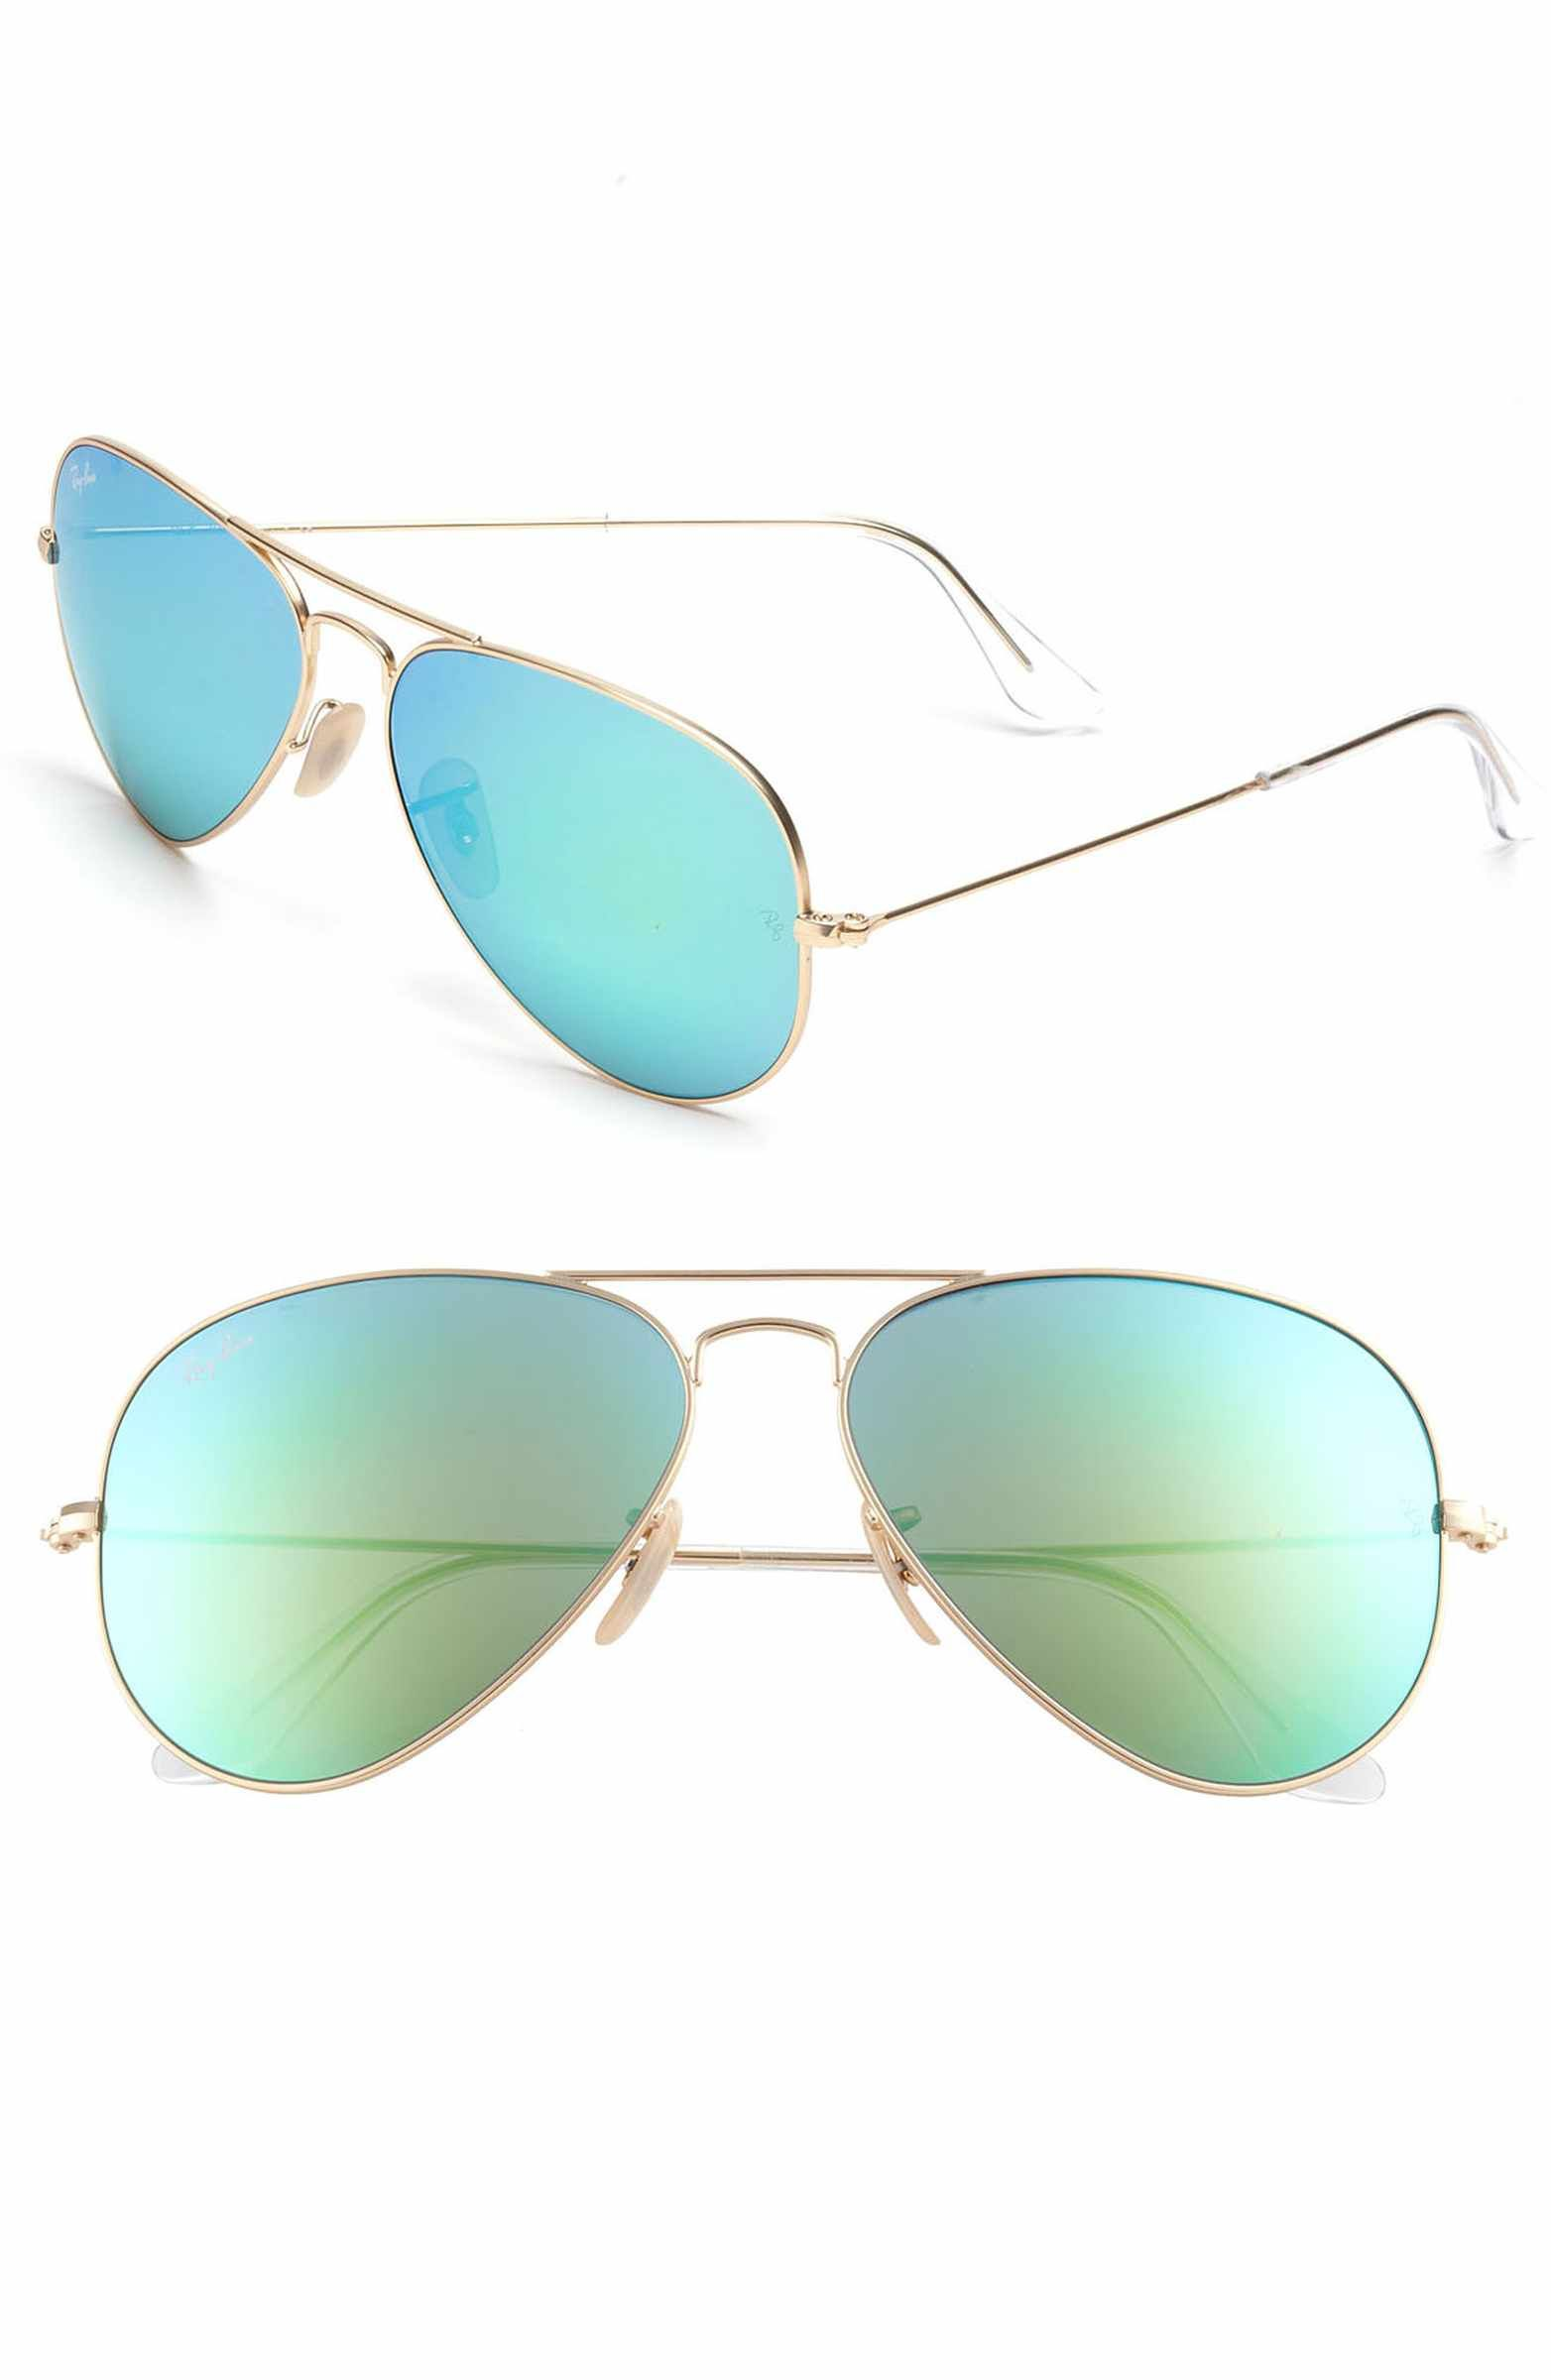 e702a41d6fc Main Image - Ray-Ban Standard Original 58mm Aviator Sunglasses ...